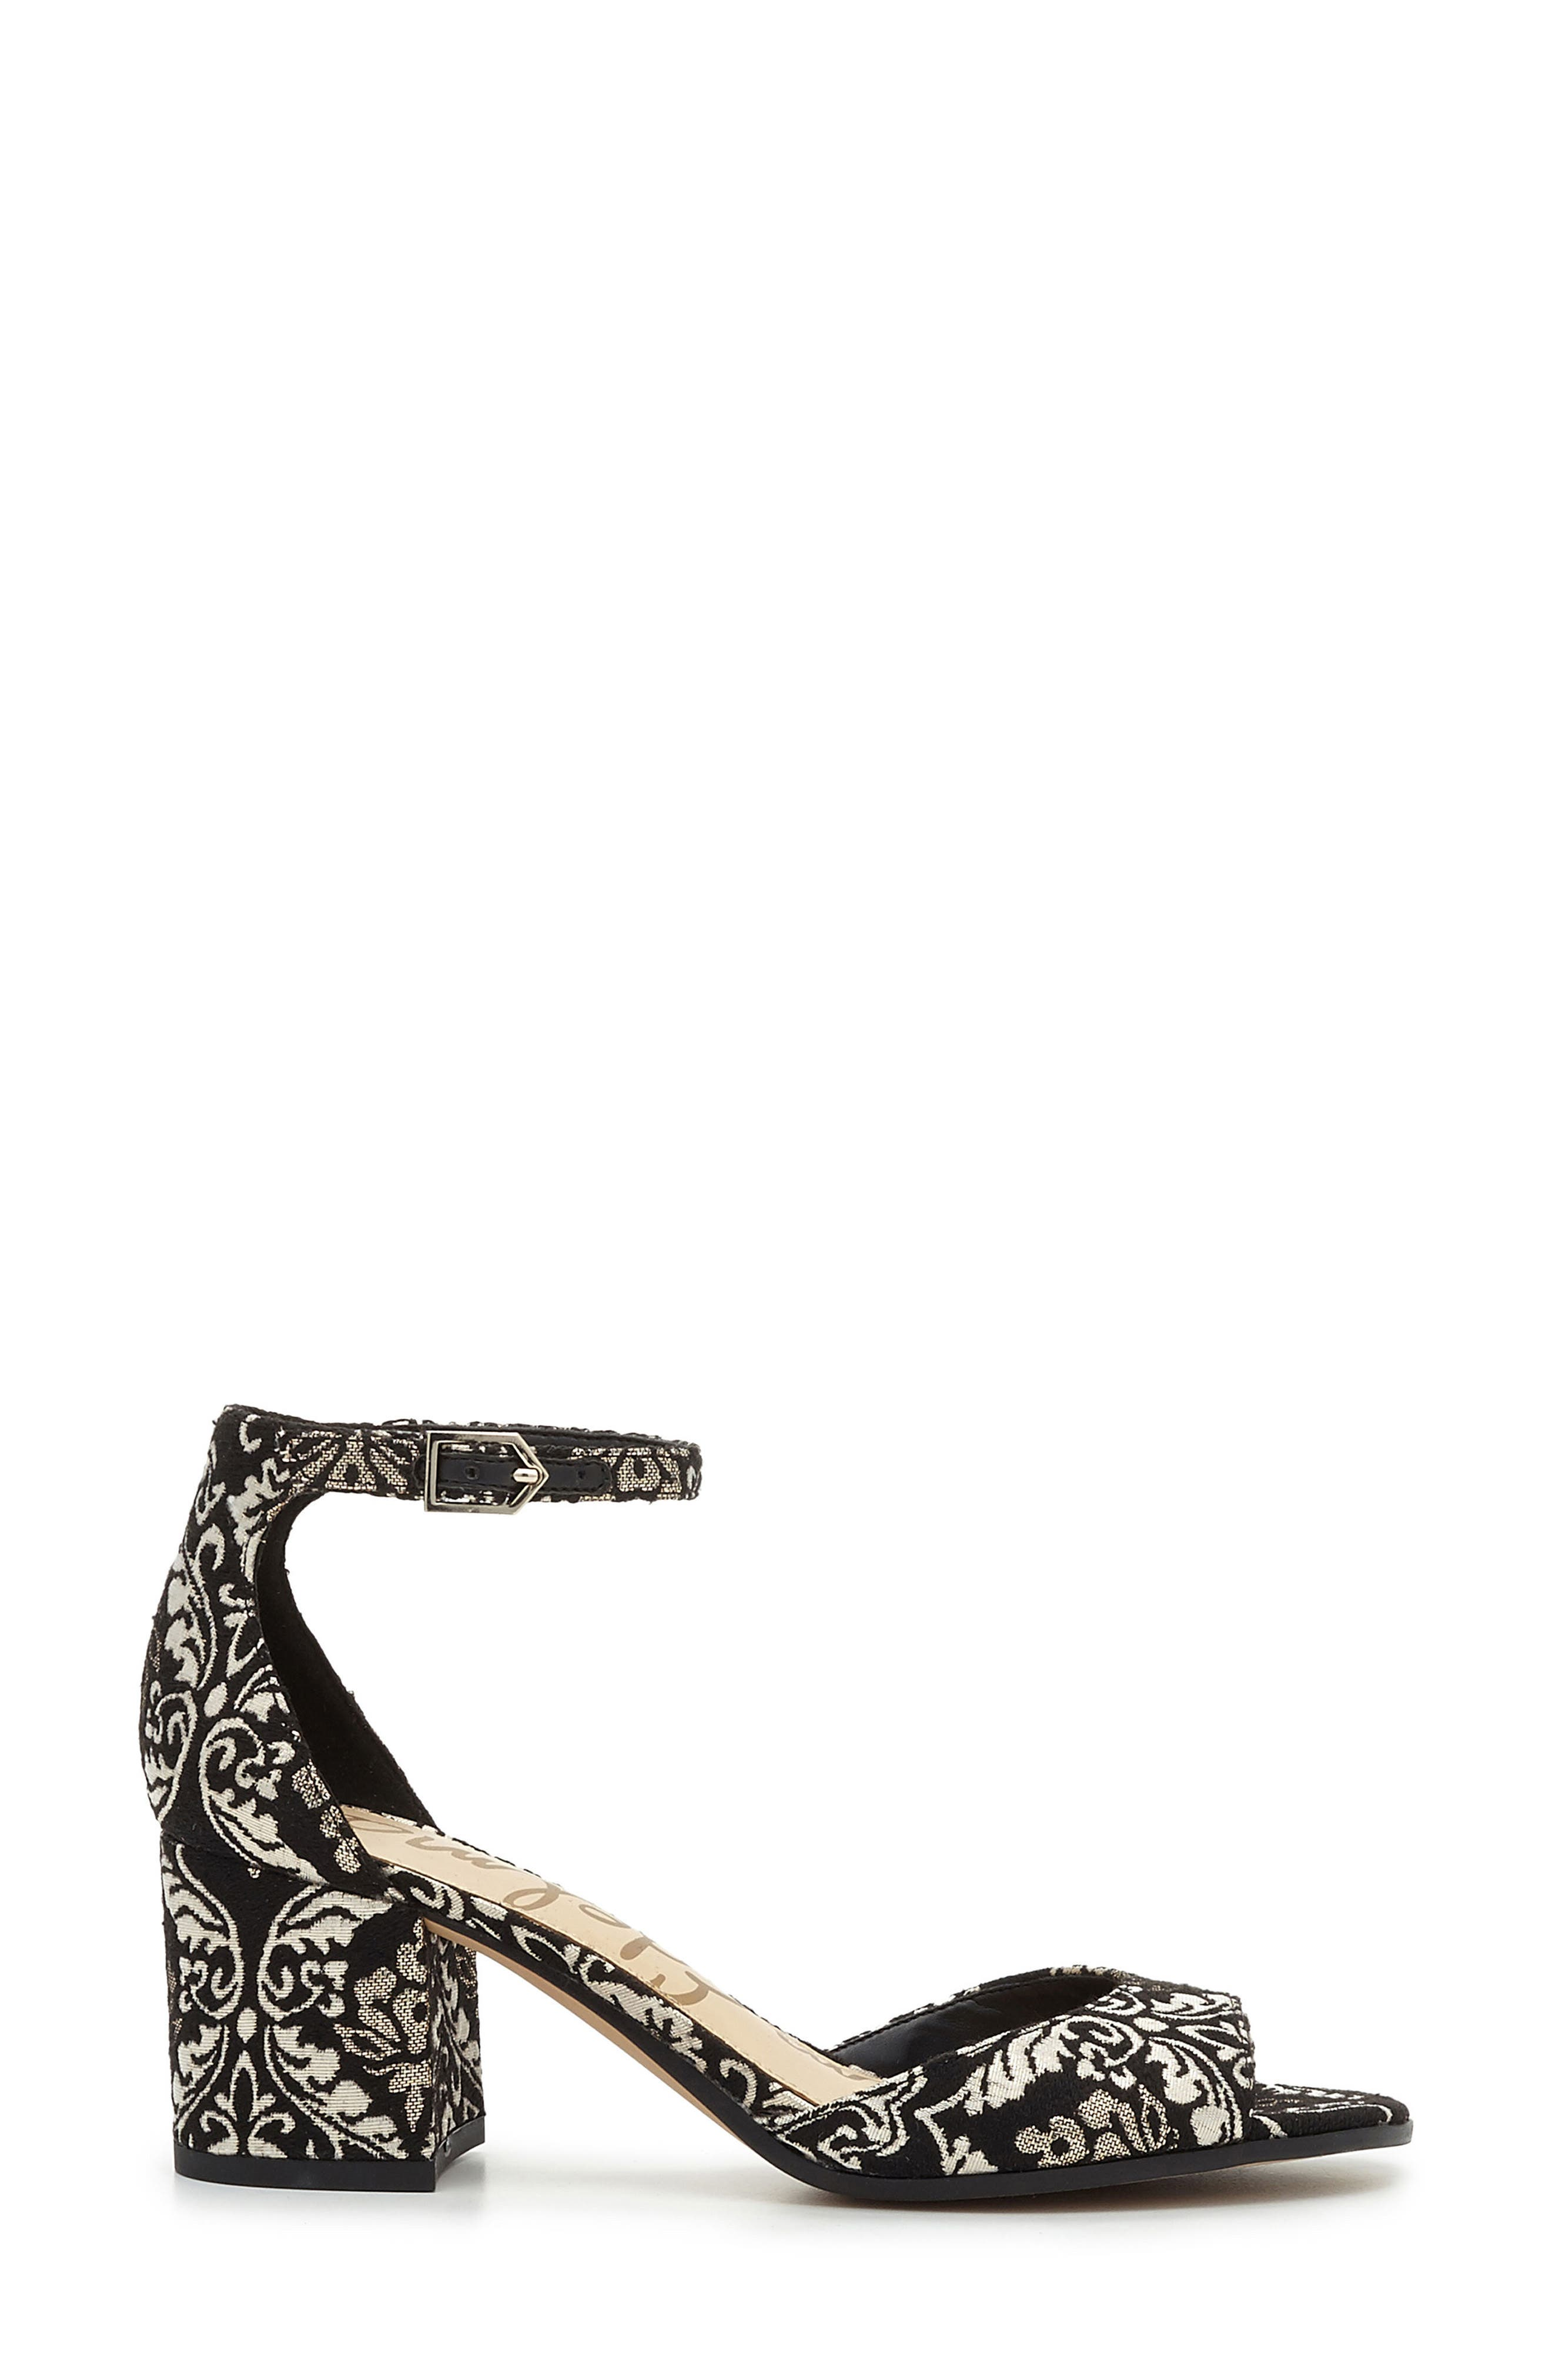 Alternate Image 3  - Sam Edelman Susie d'Orsay Ankle Strap Sandal (Women)